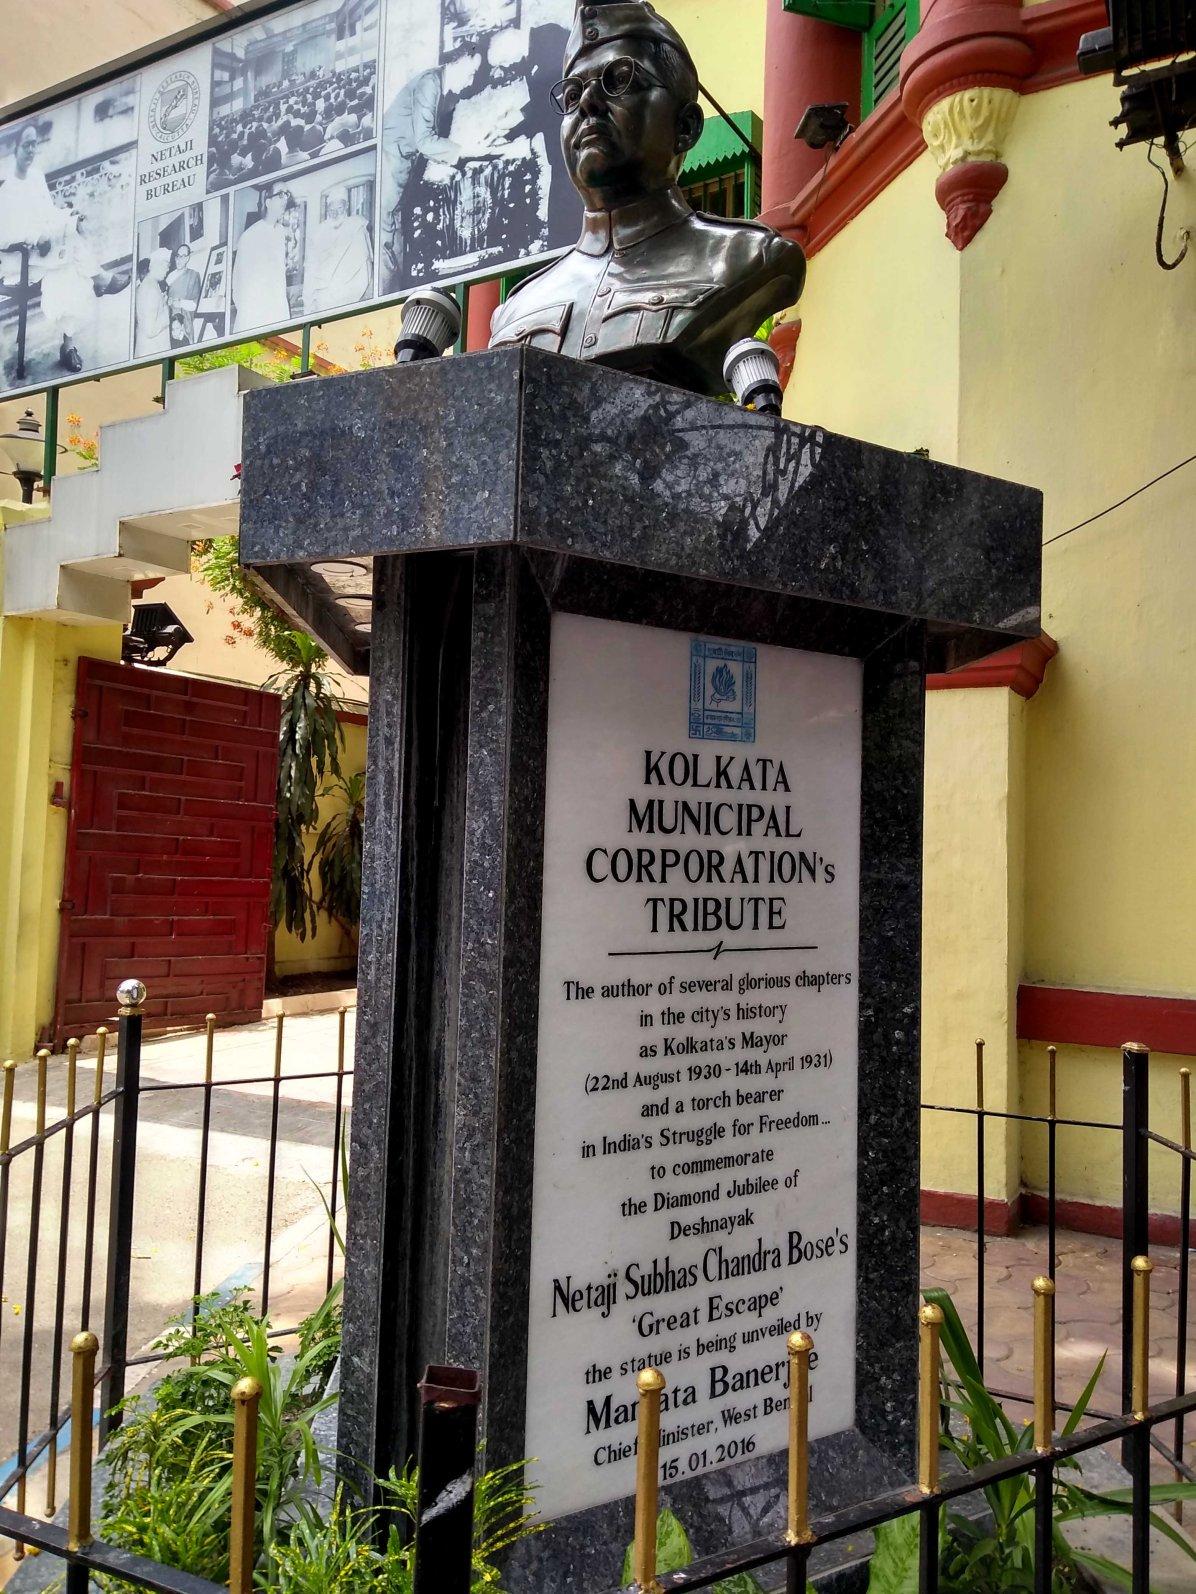 Not many knew that Netaji had served as Calcutta's mayor